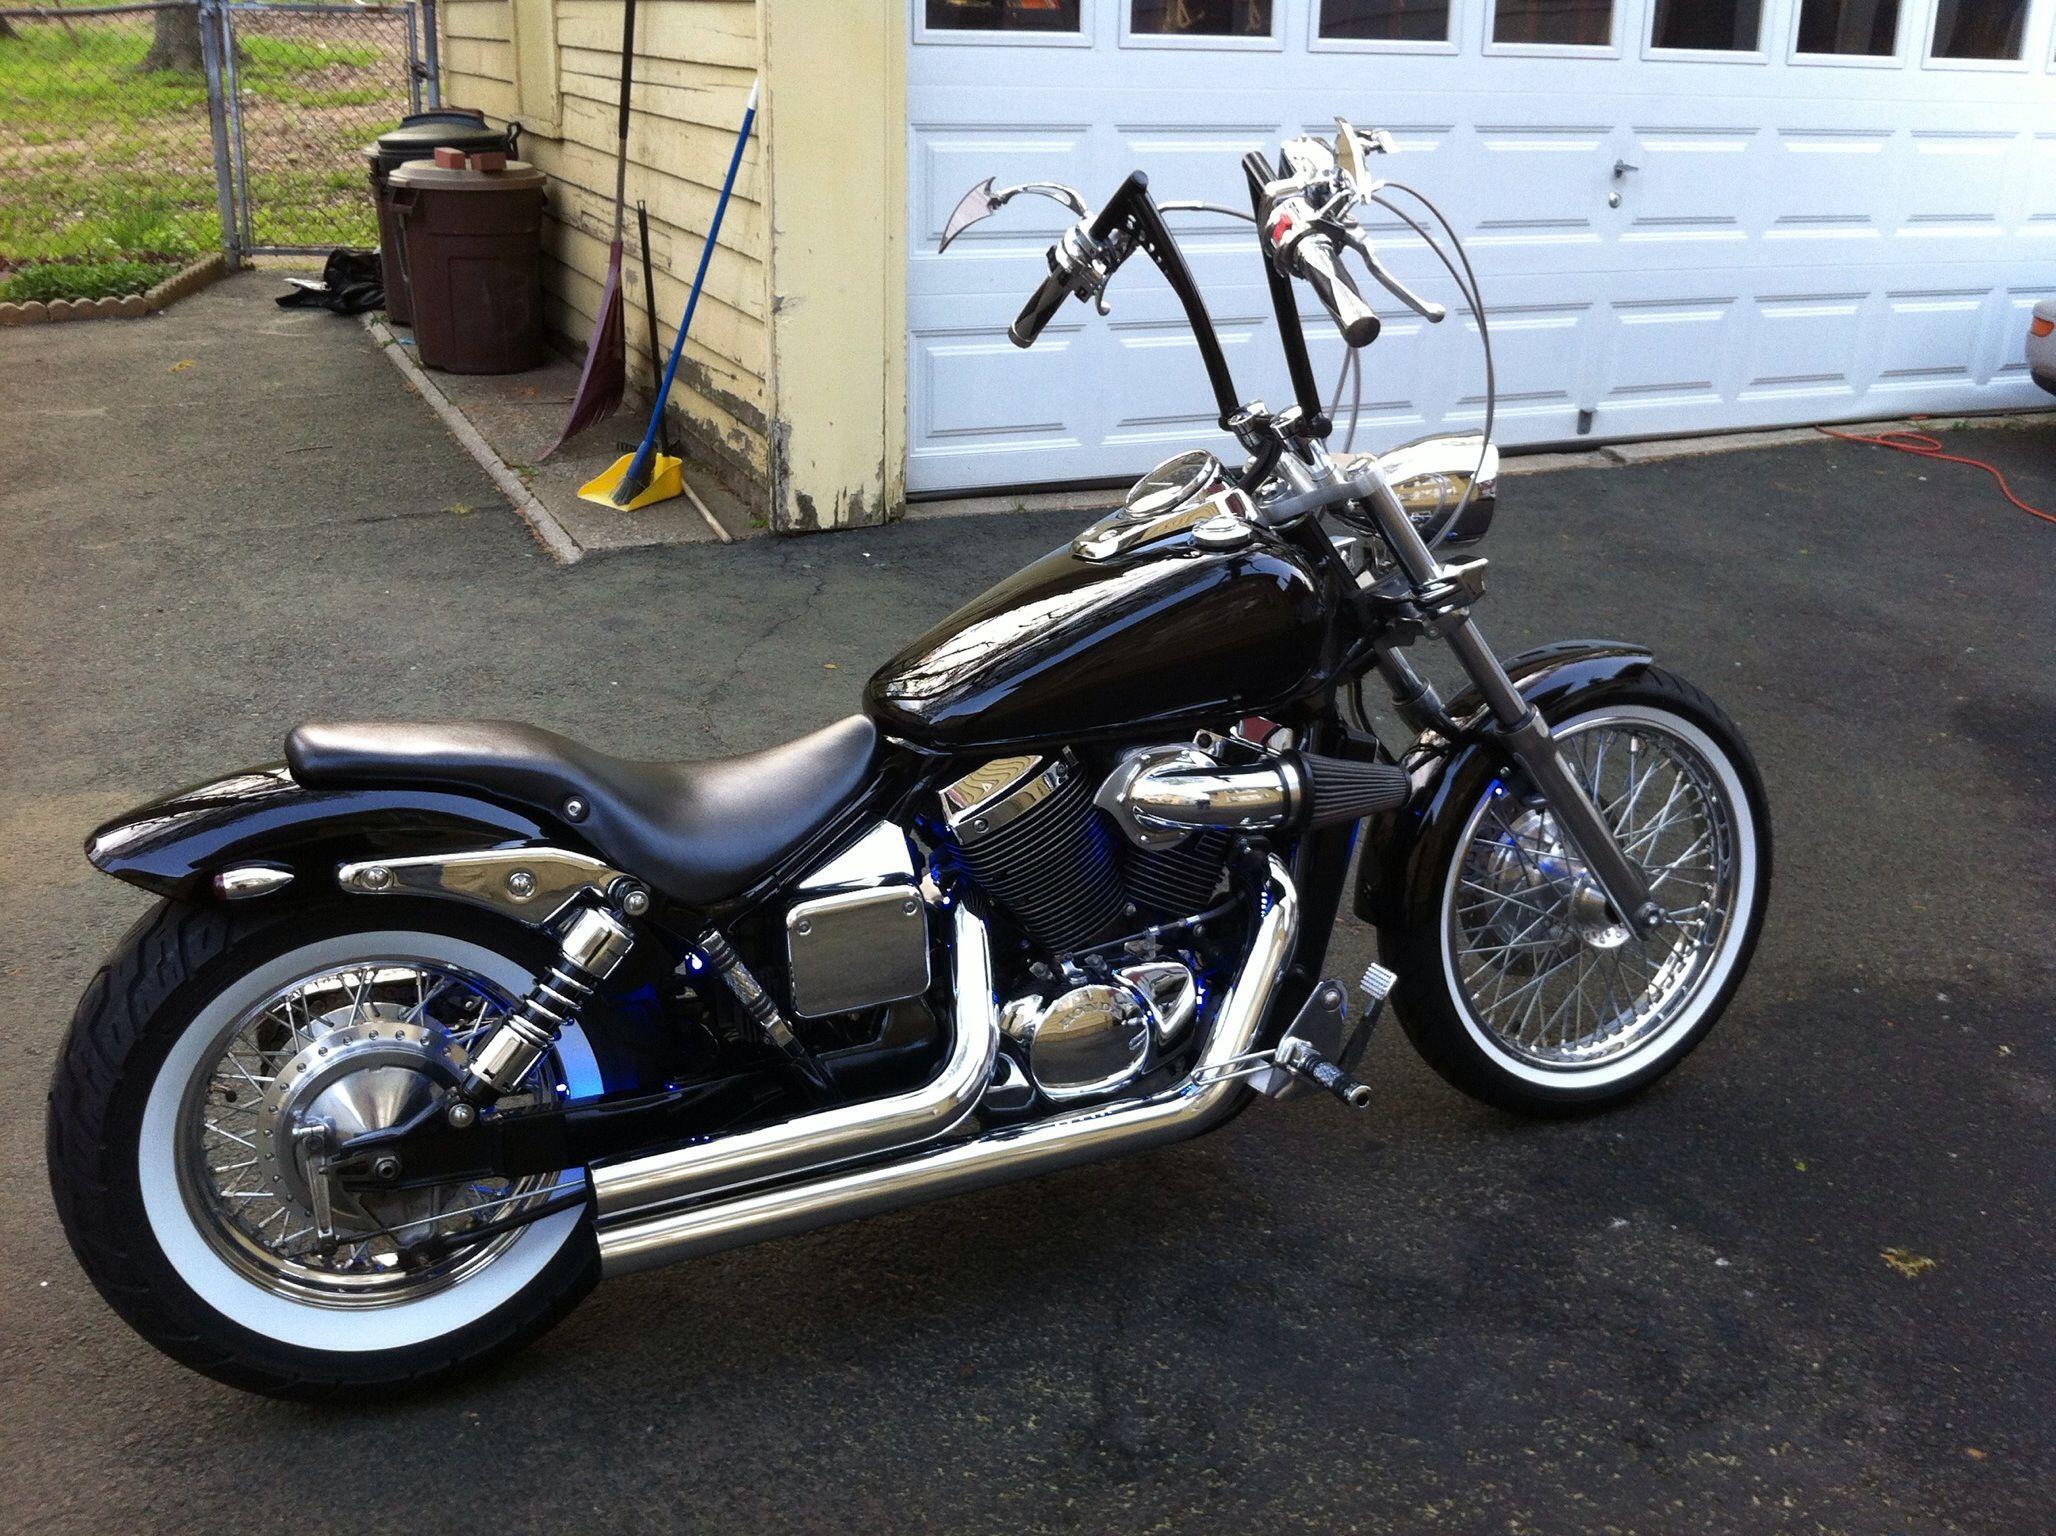 Gabes 2003 Honda Shadow Spirit 750 Cool Motorcycles Honda